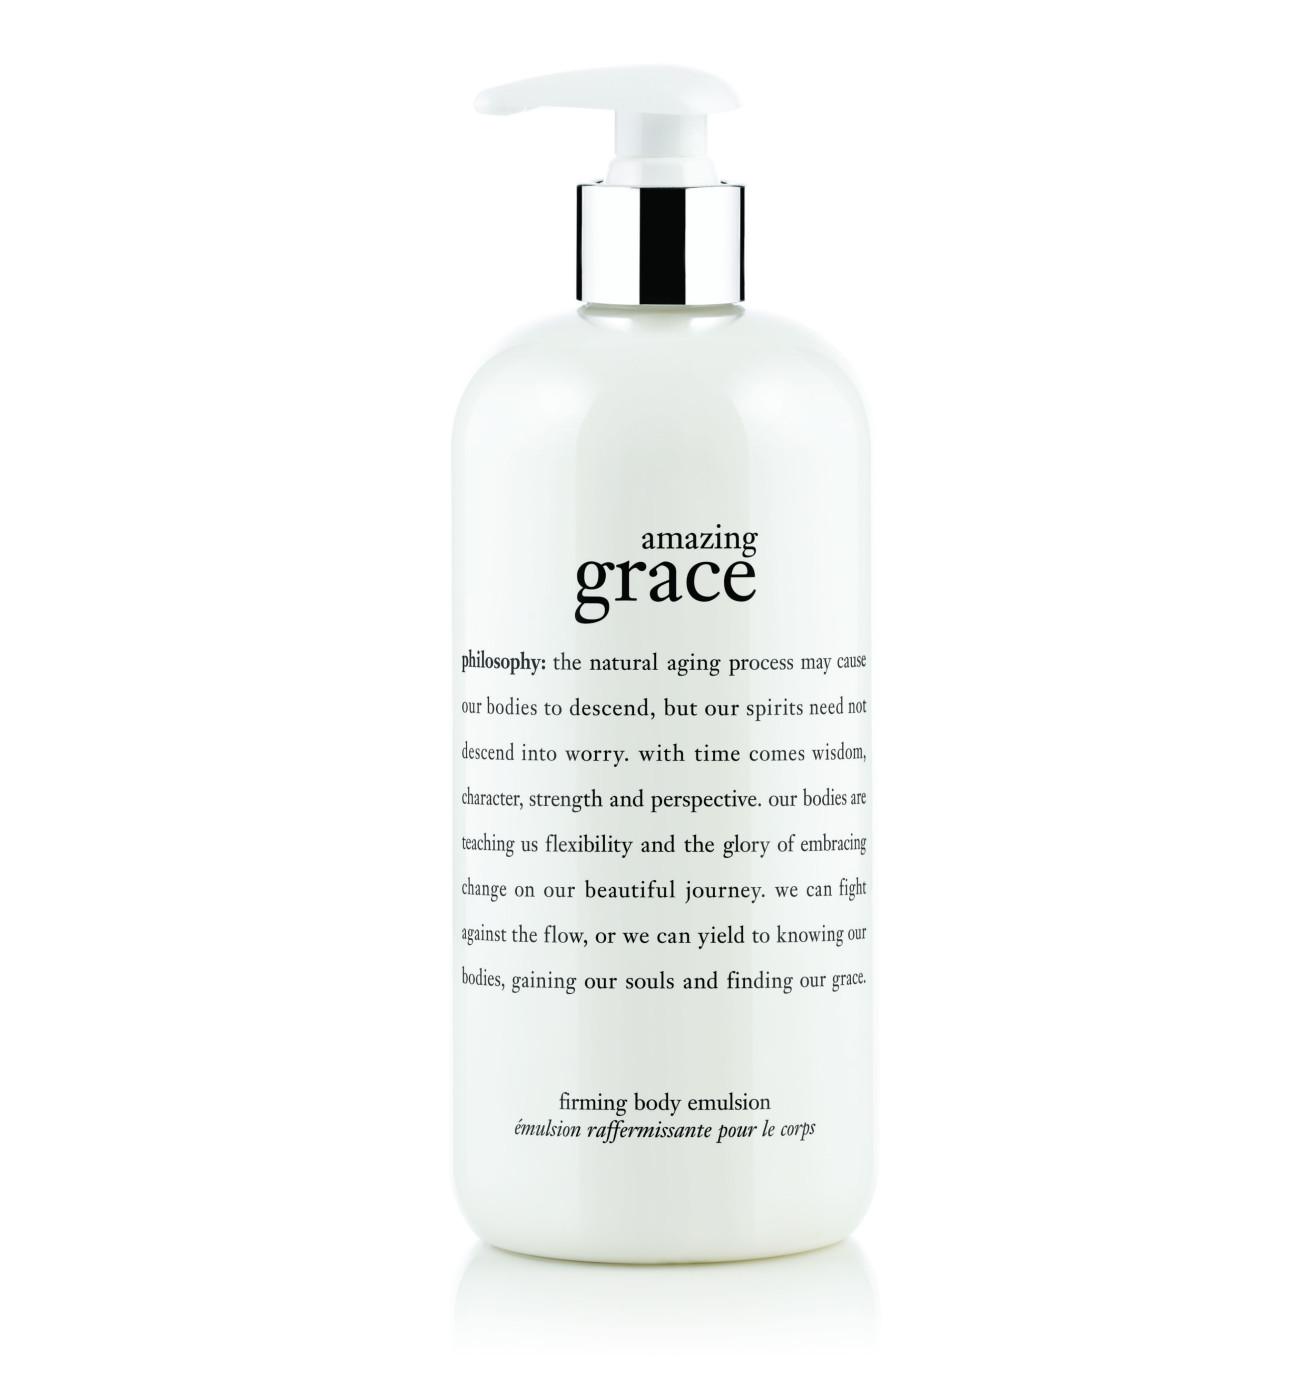 philosophy beauty skincare fragrances buy now david jones amazing grace body firming emulsion 480ml